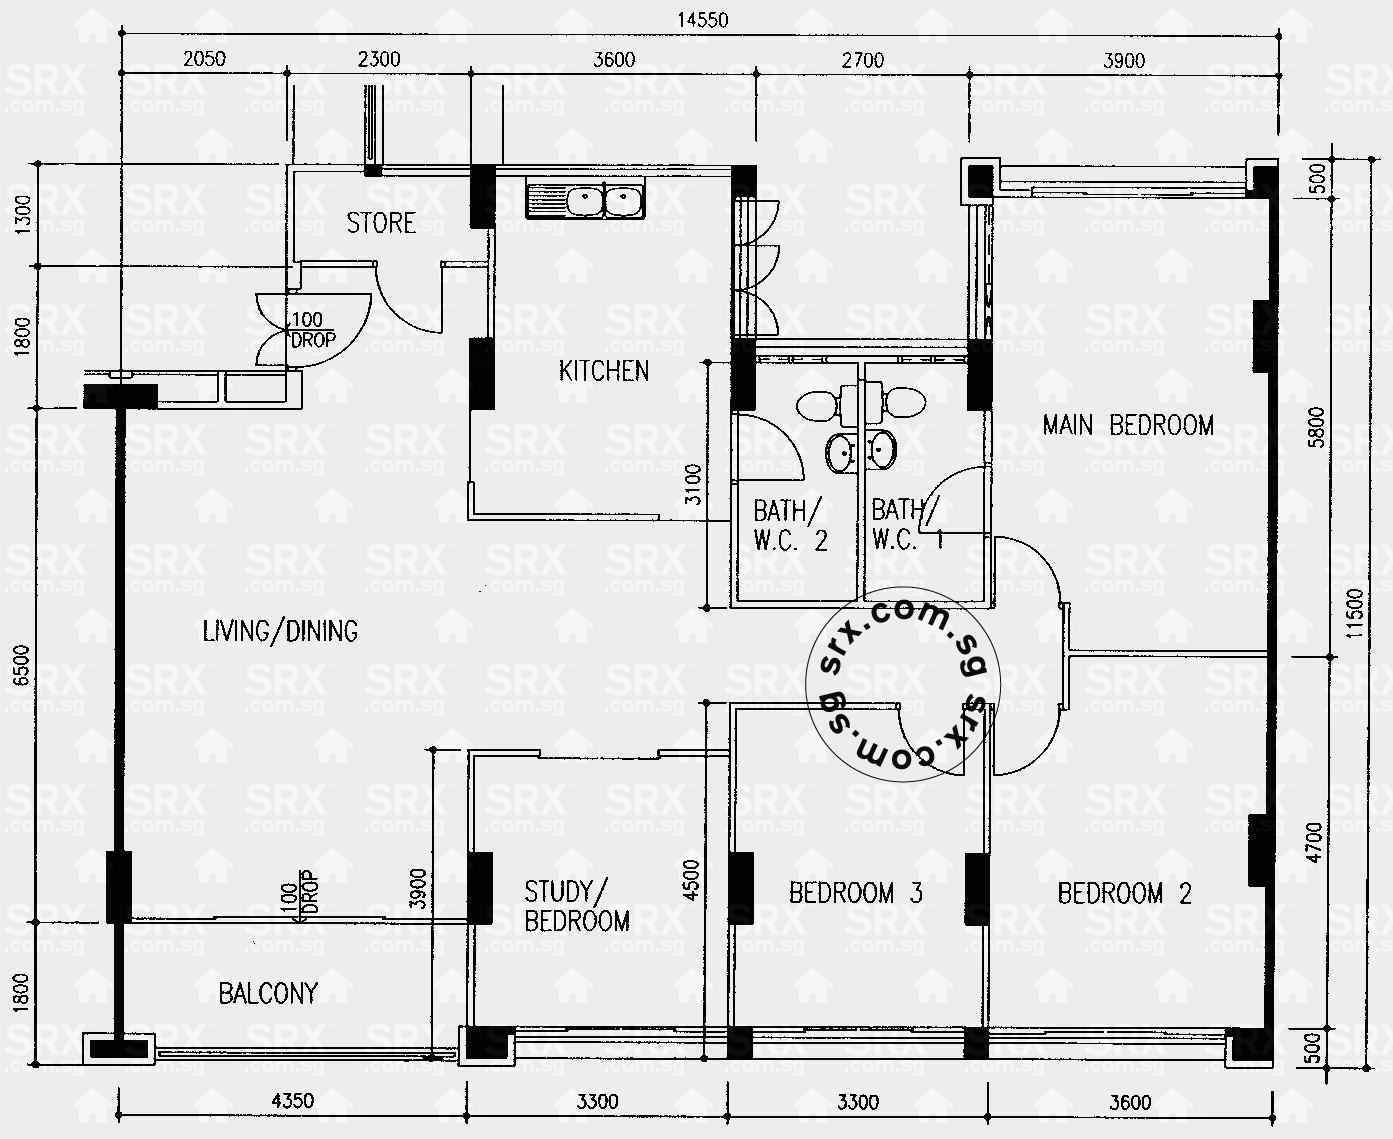 hougang street 51 hdb details srx property compassvale bow hdb details srx property